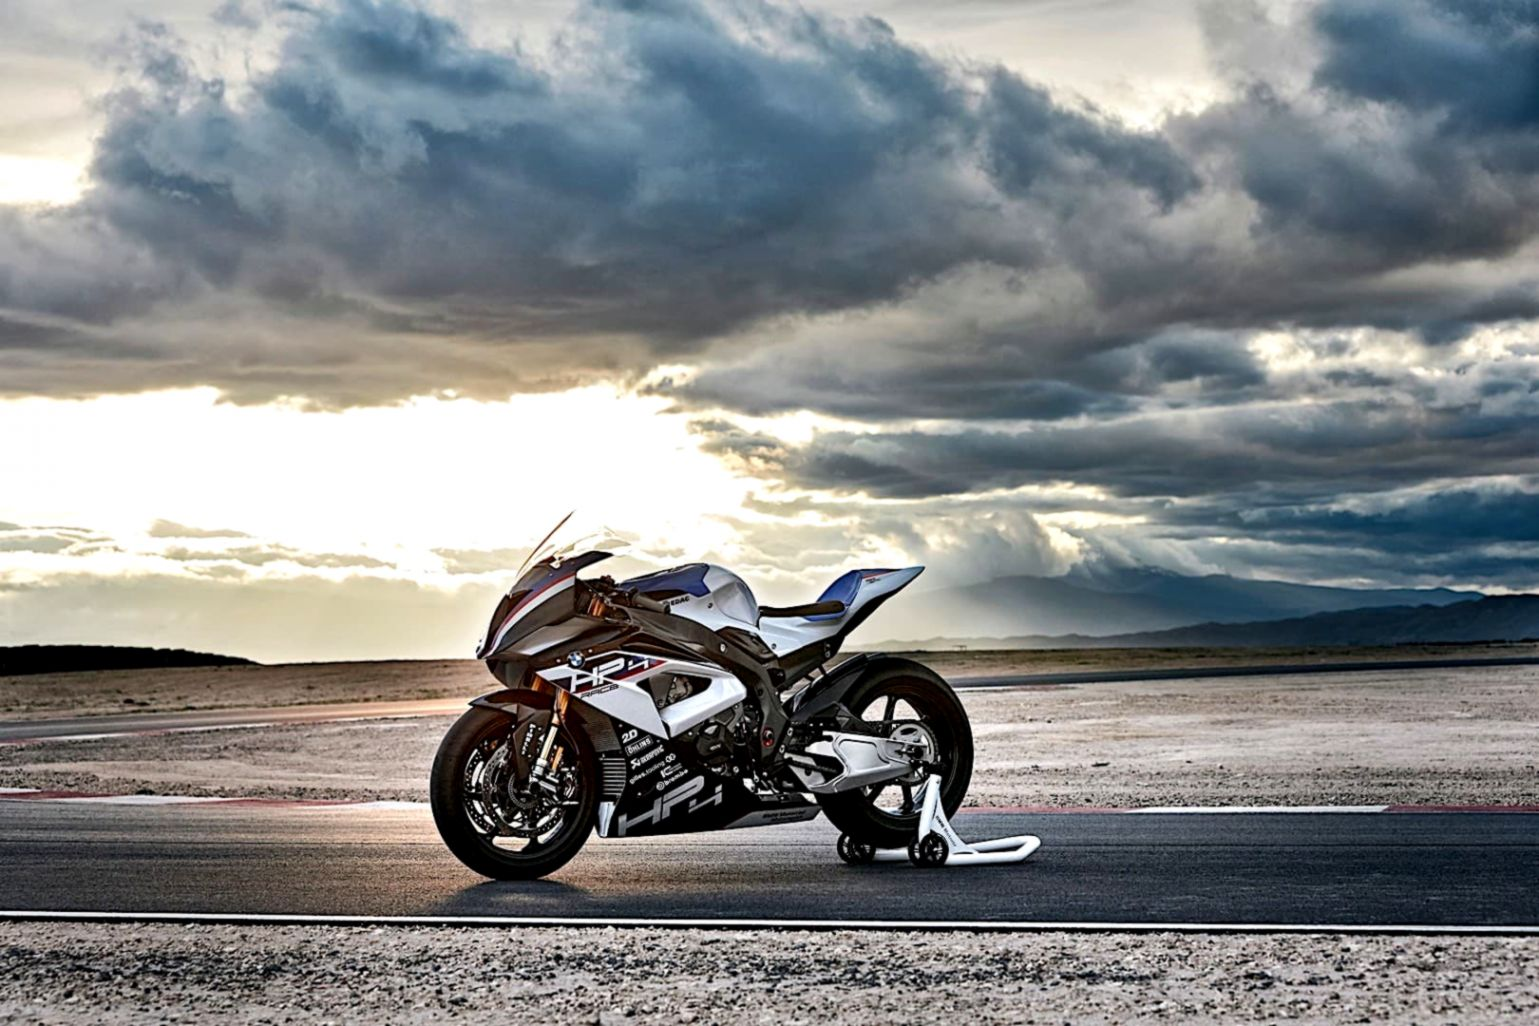 Motorcycle Bmw Hp4 Hd Wallpaper Wallpapers Screen